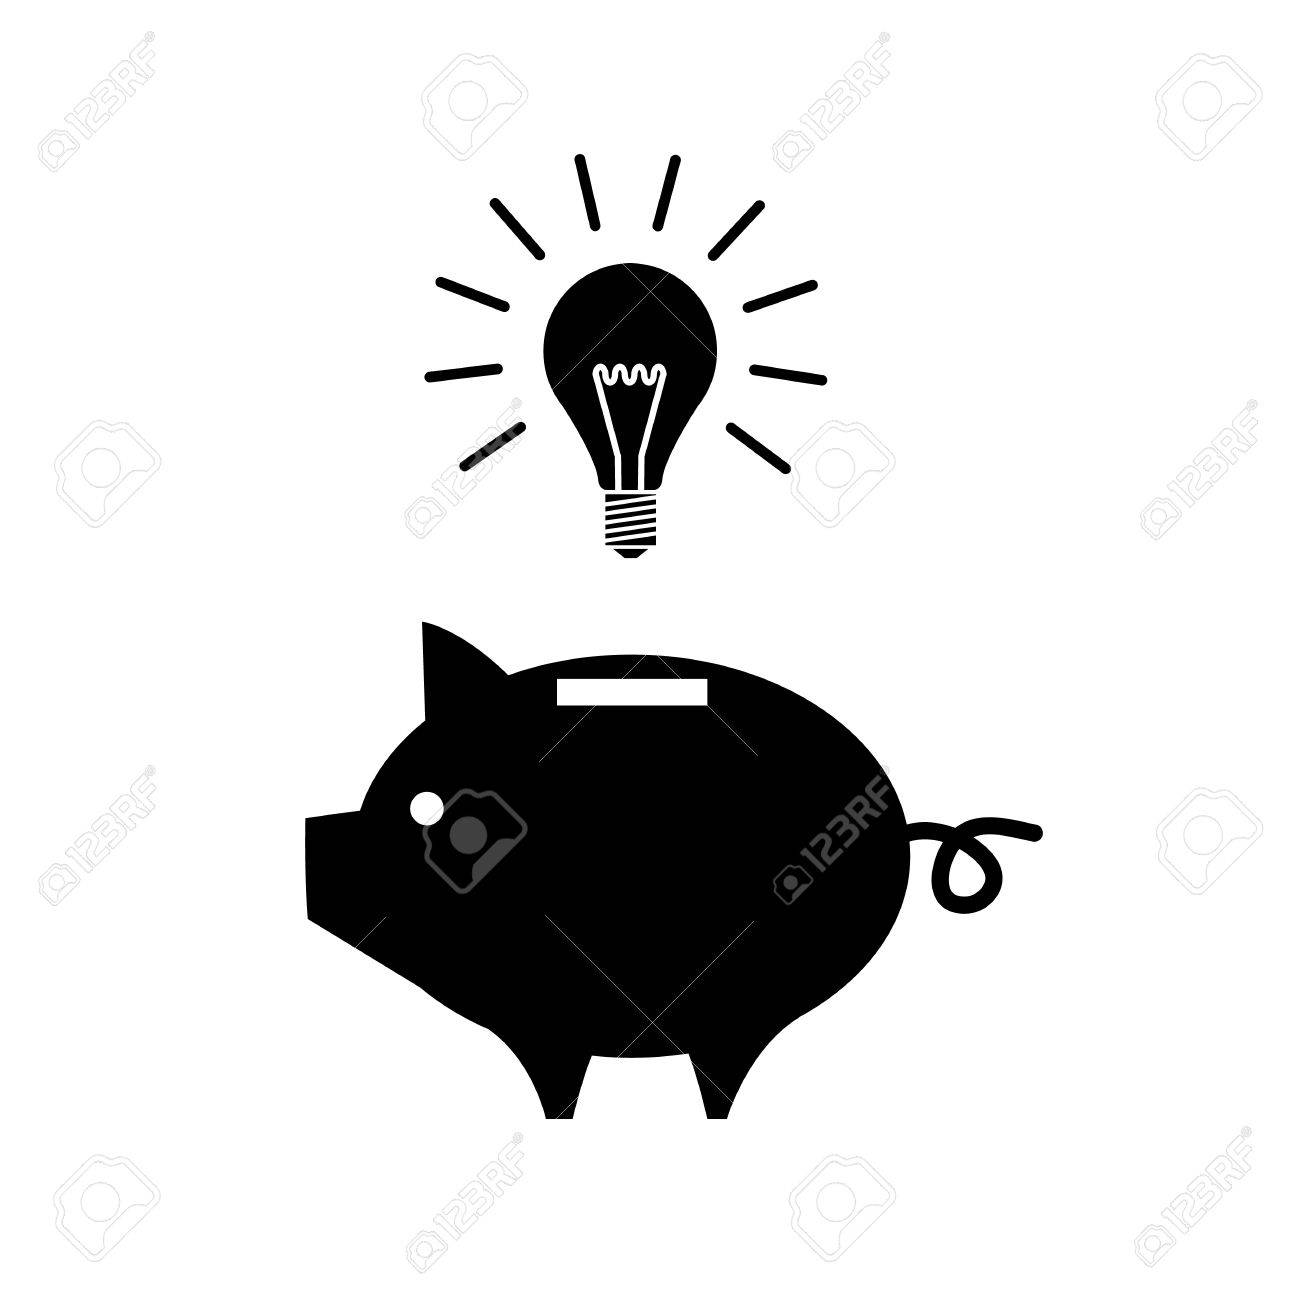 Vektor Piggy Spardose Neue Idee Mit Glühlampe Symbol   Moderne ...